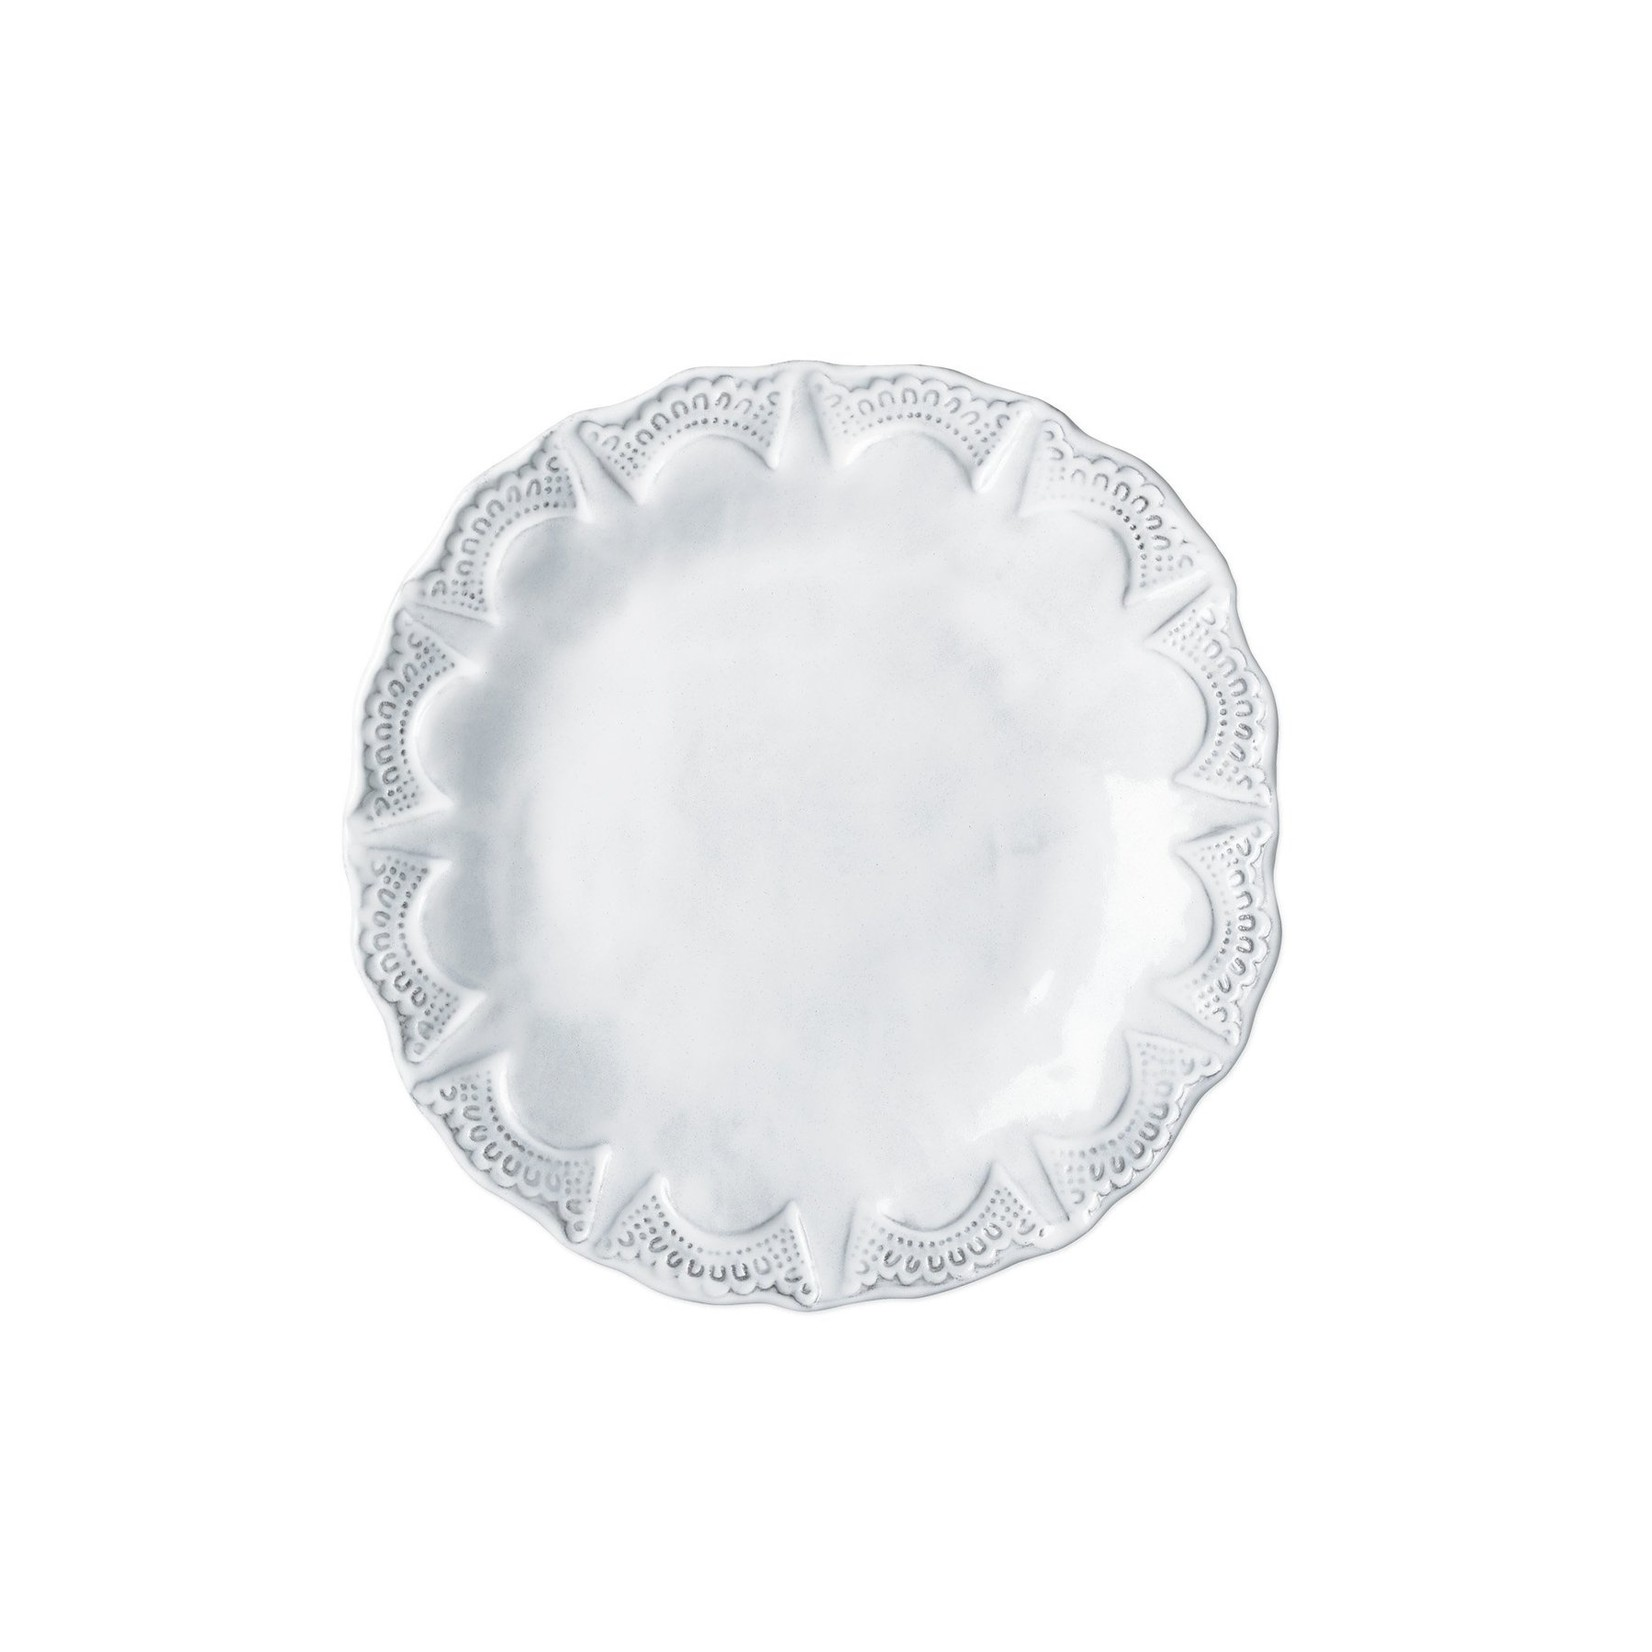 Vietri Incanto Stone Salad Plate